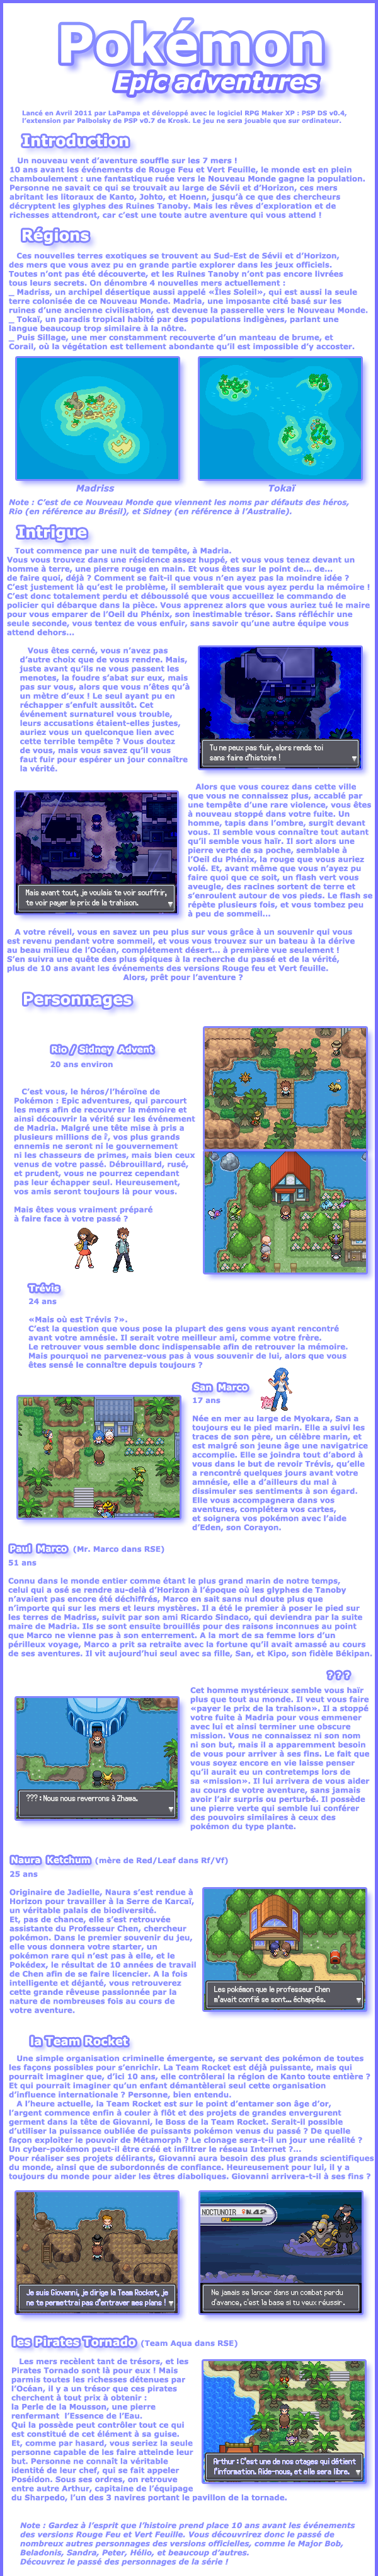 Pokémon Script Project 1343986319-presentation-pokemon-epic-adventures-1